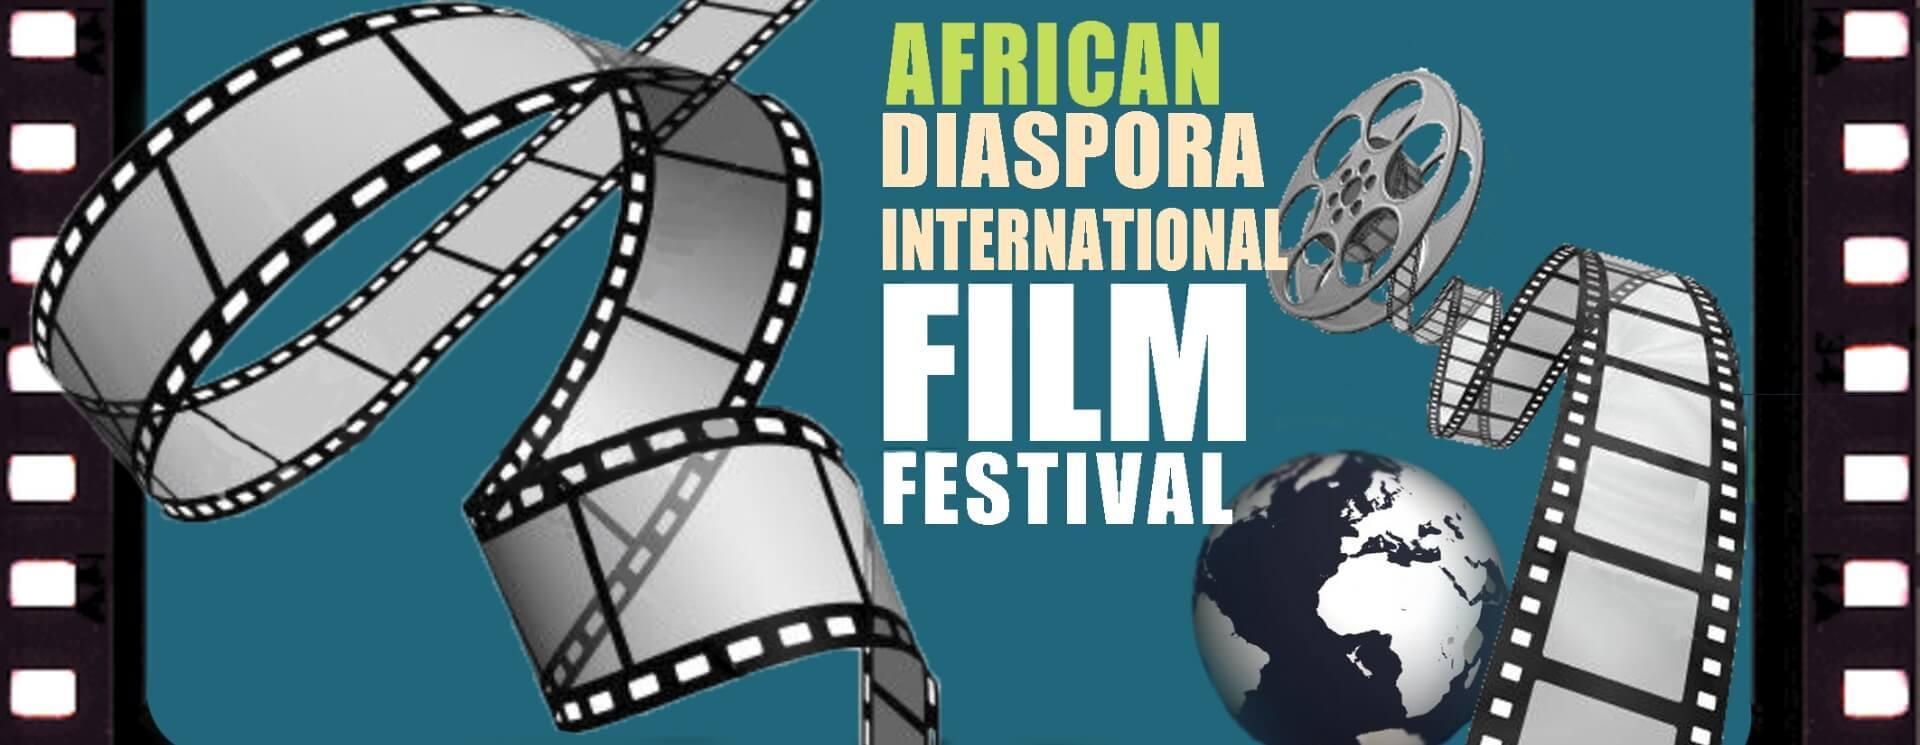 Martinique takes center stage at African Diaspora International Film Festival